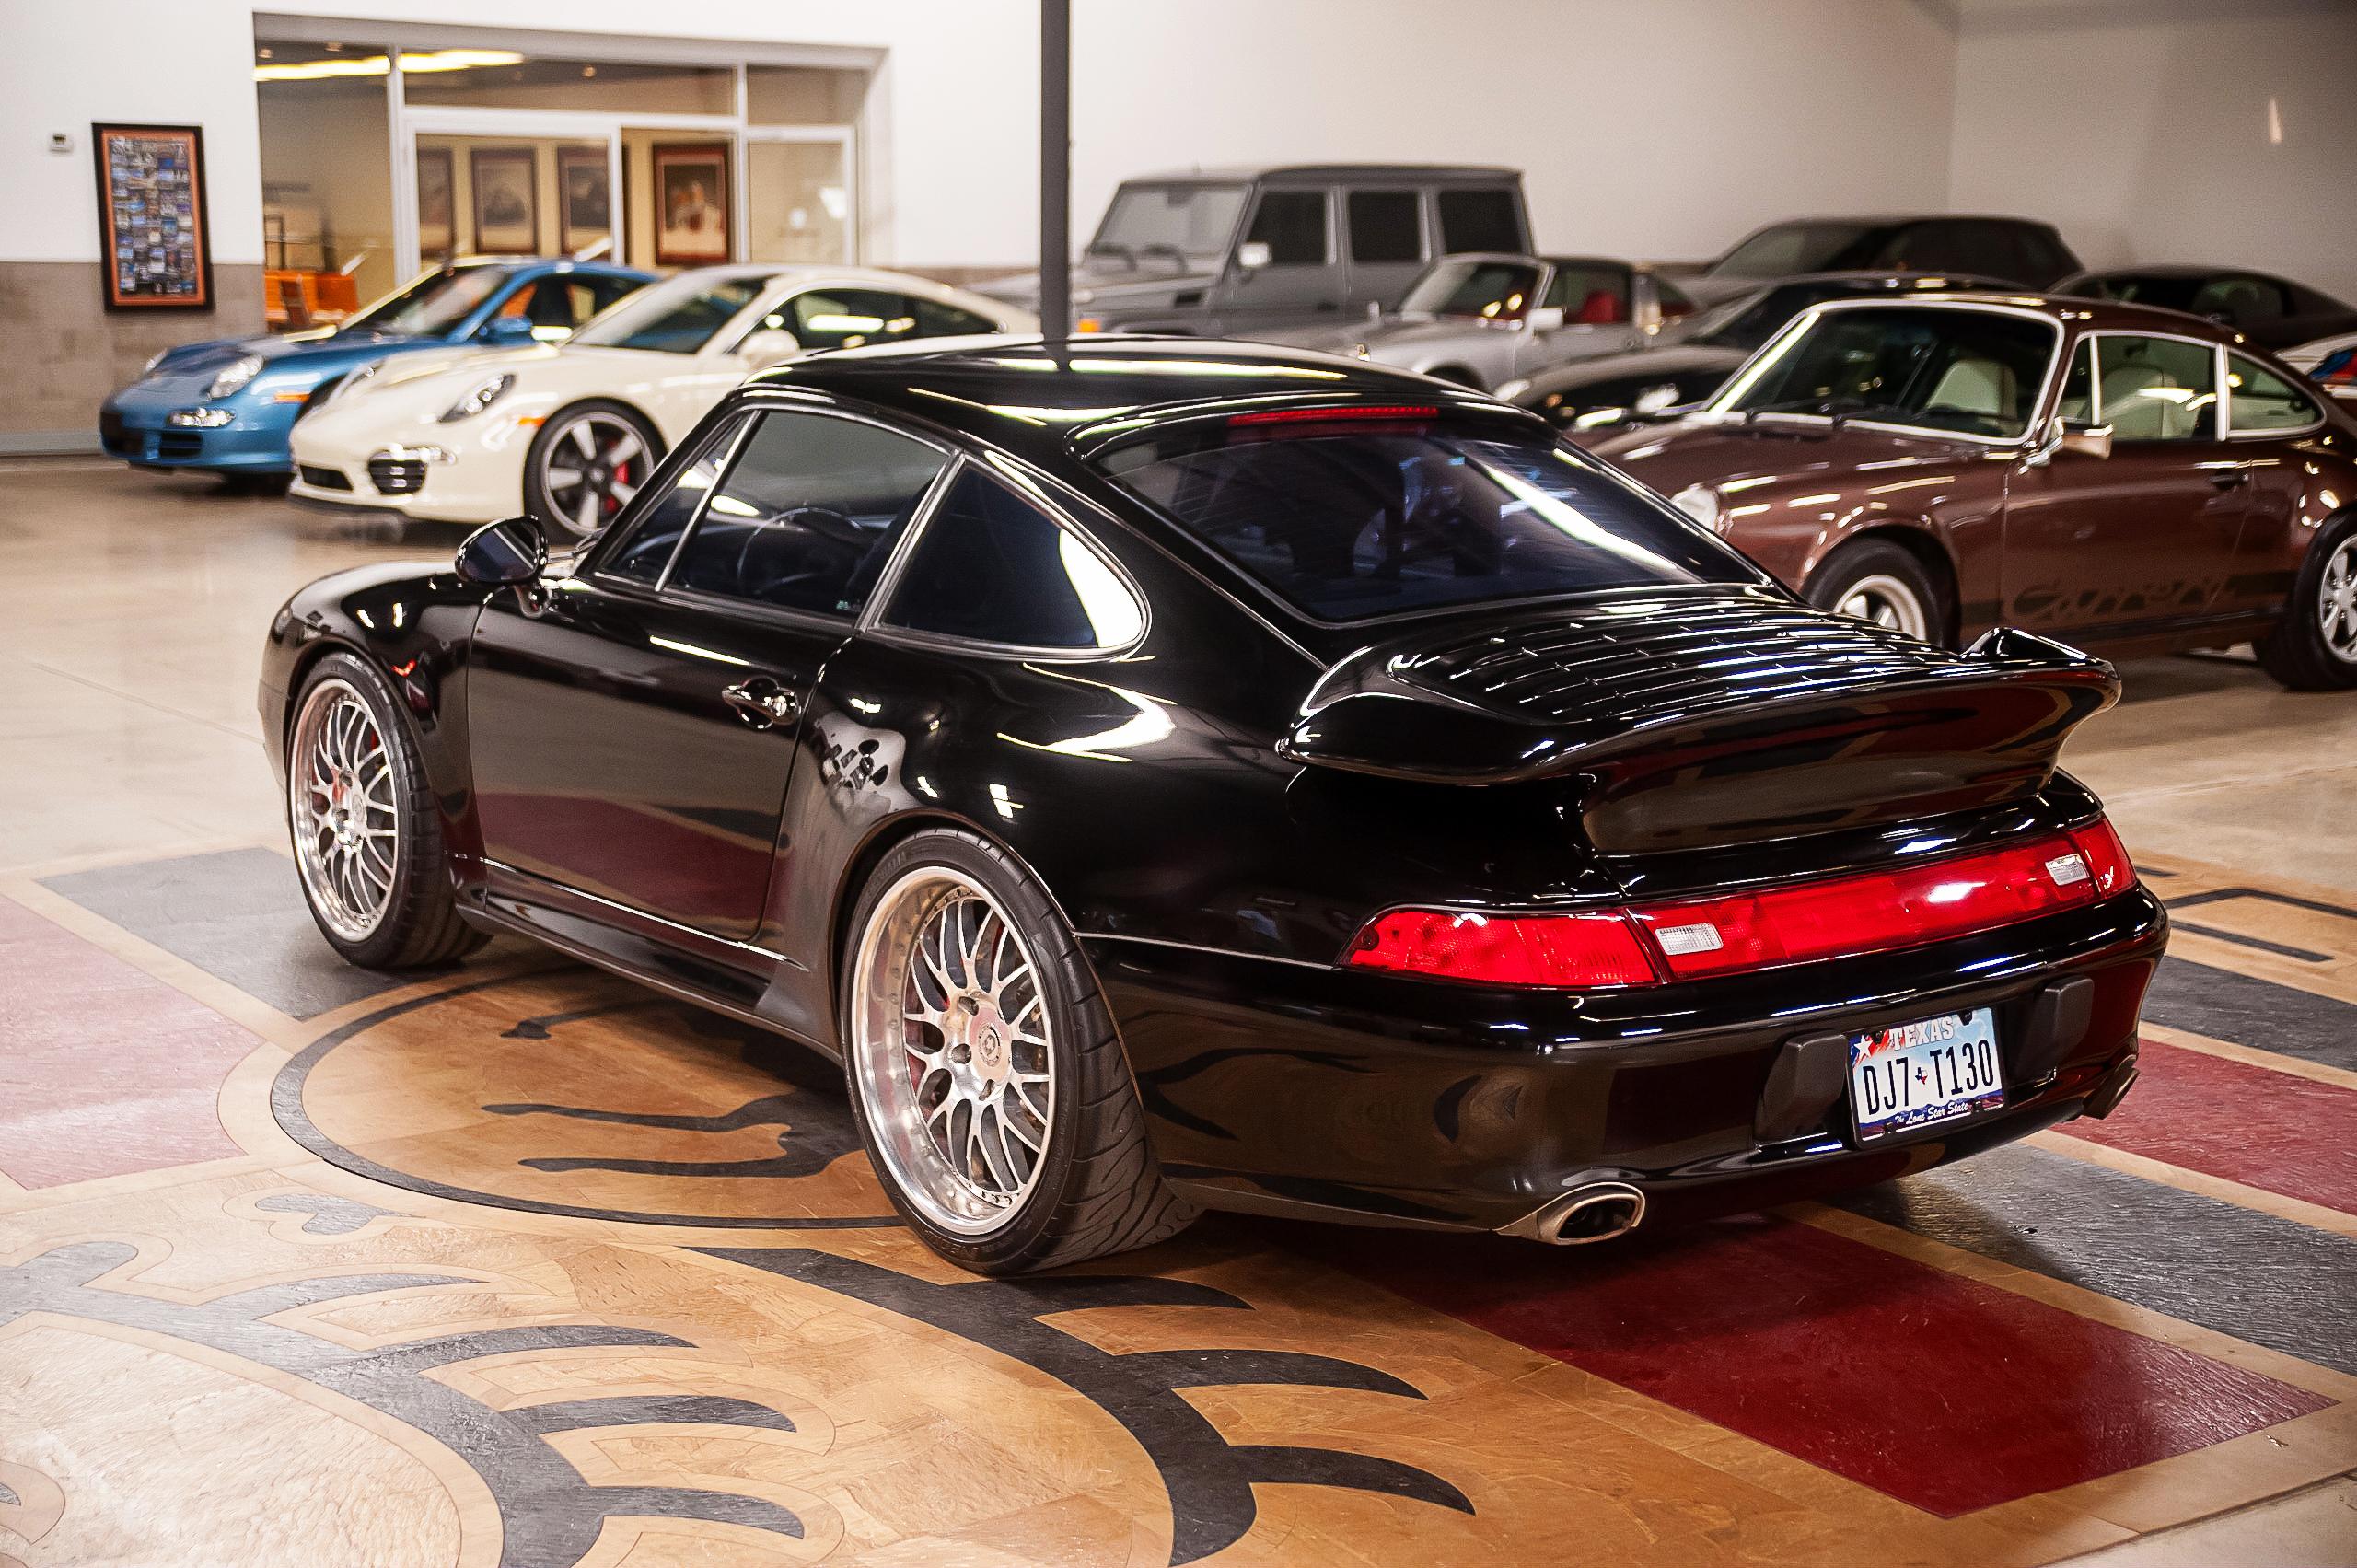 Awd Sports Cars >> 1996 Porsche 911 C4S 993 - Trissl Sports Cars